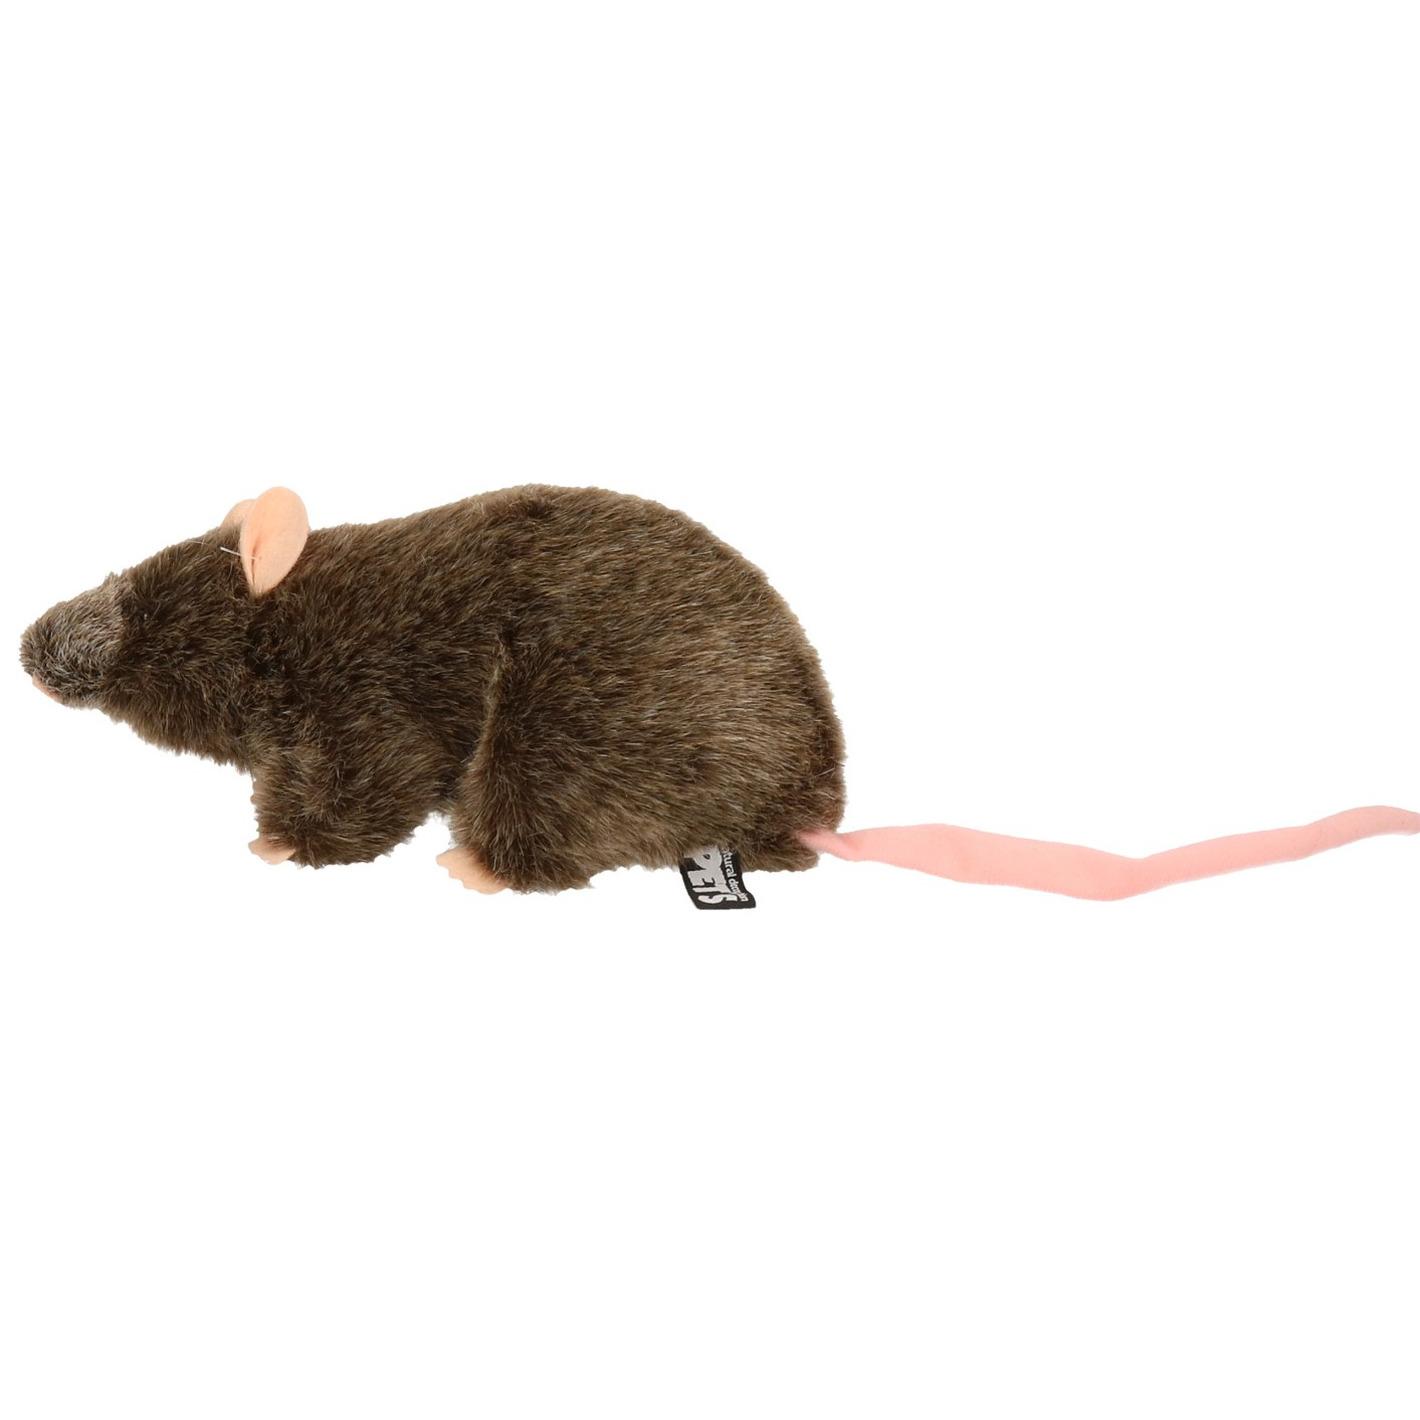 Bruine ratten knuffels 22 cm knuffeldieren